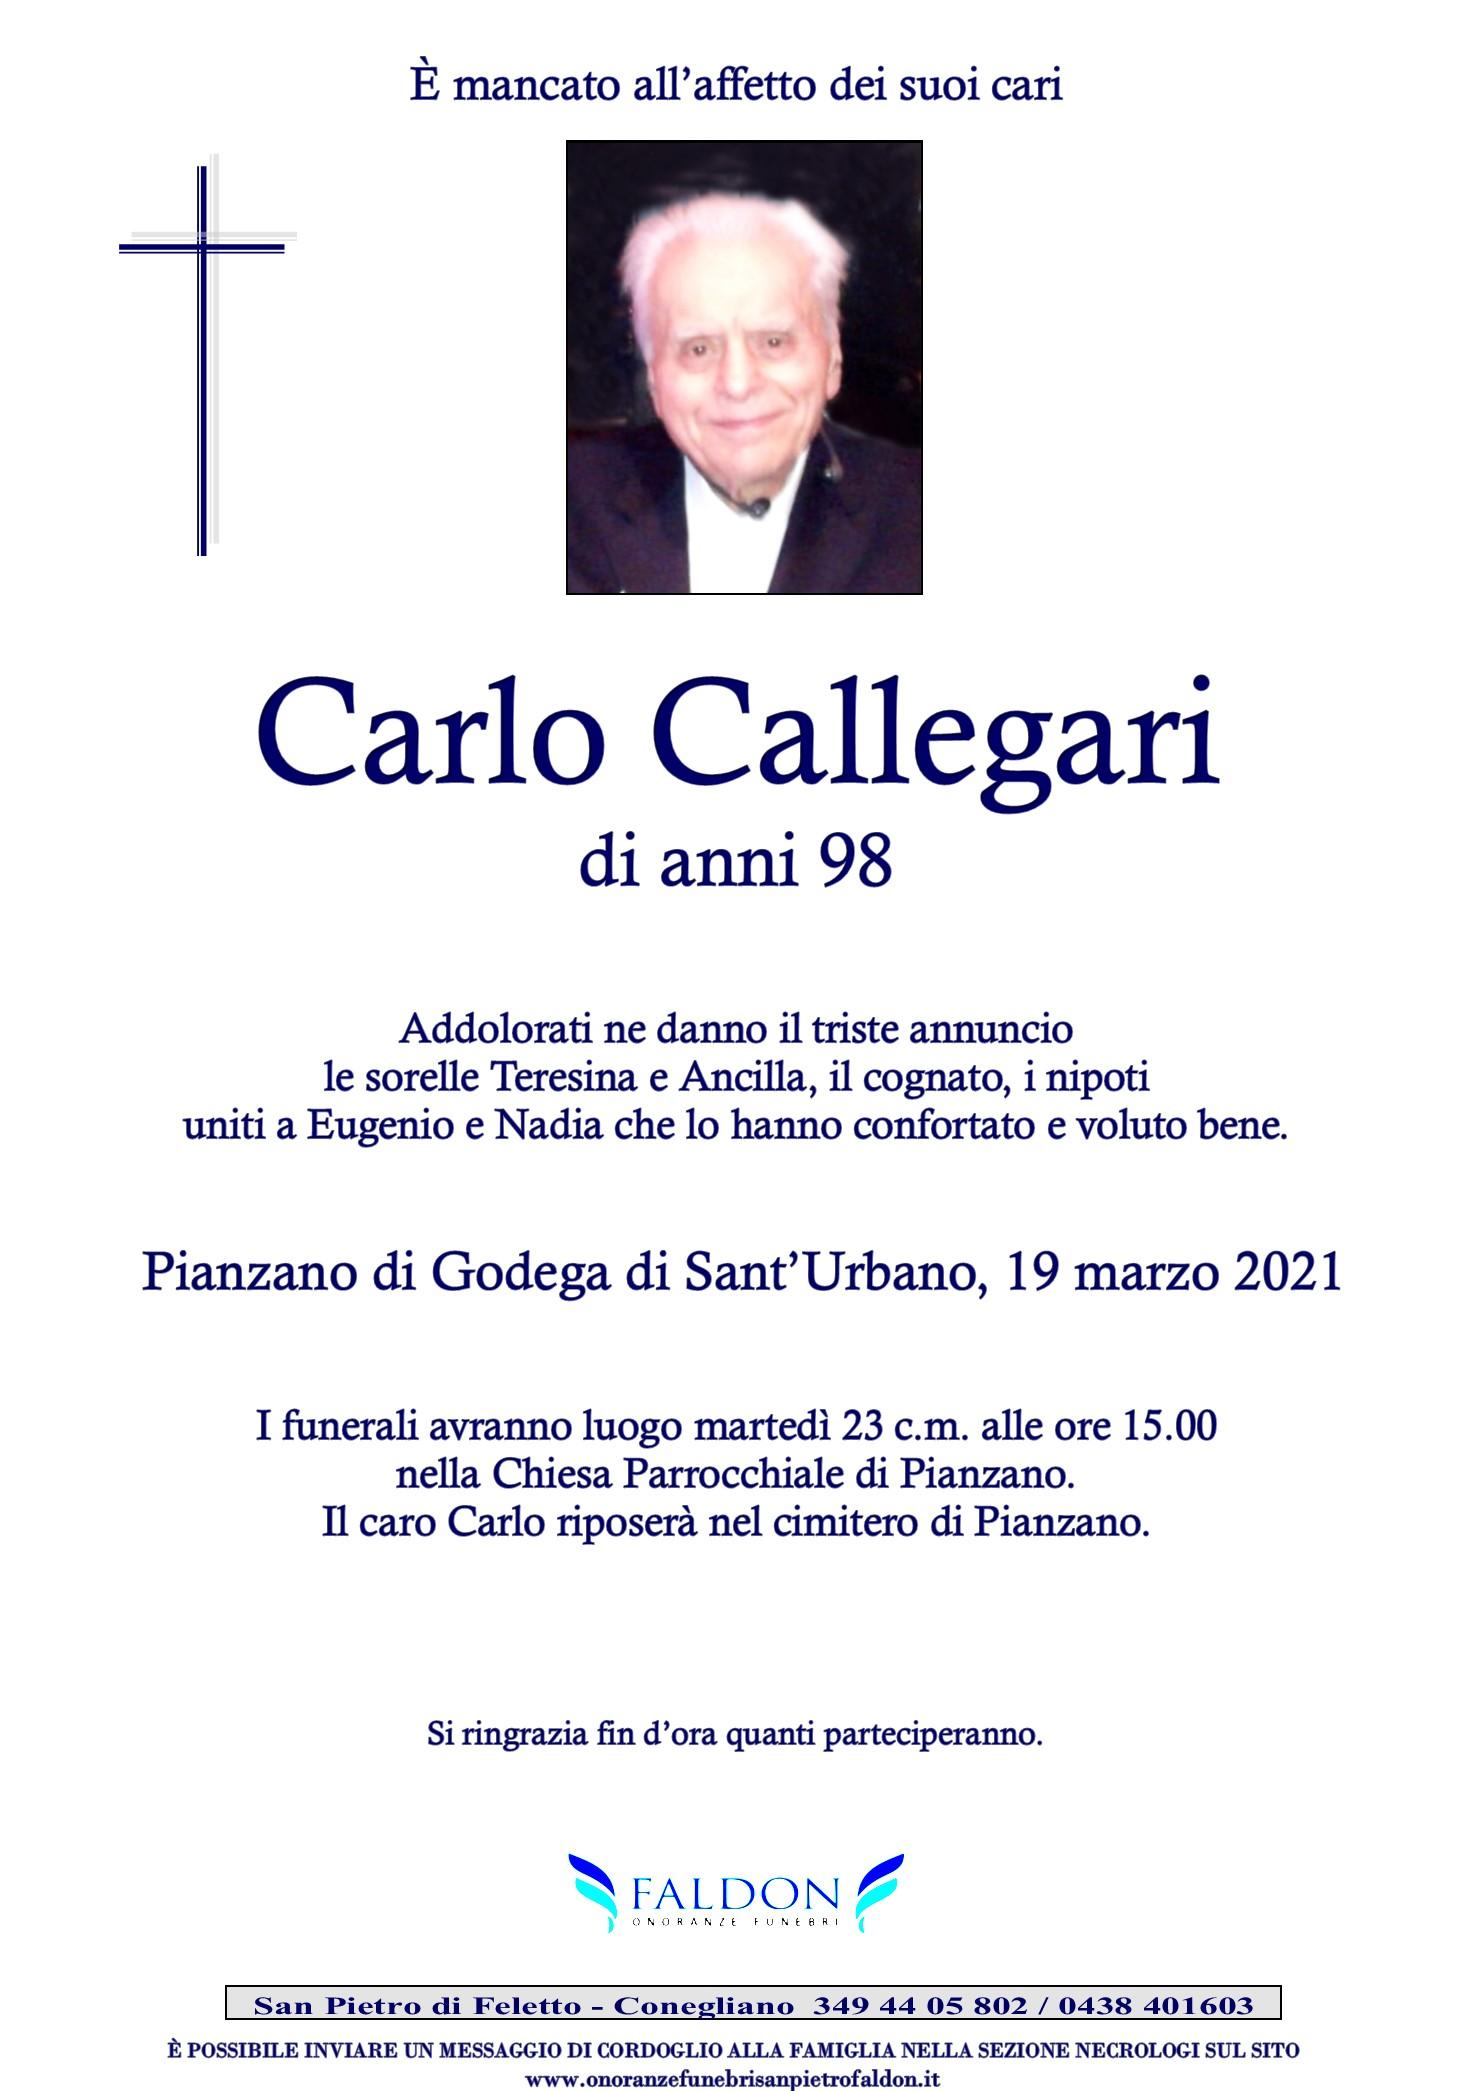 Carlo Callegari